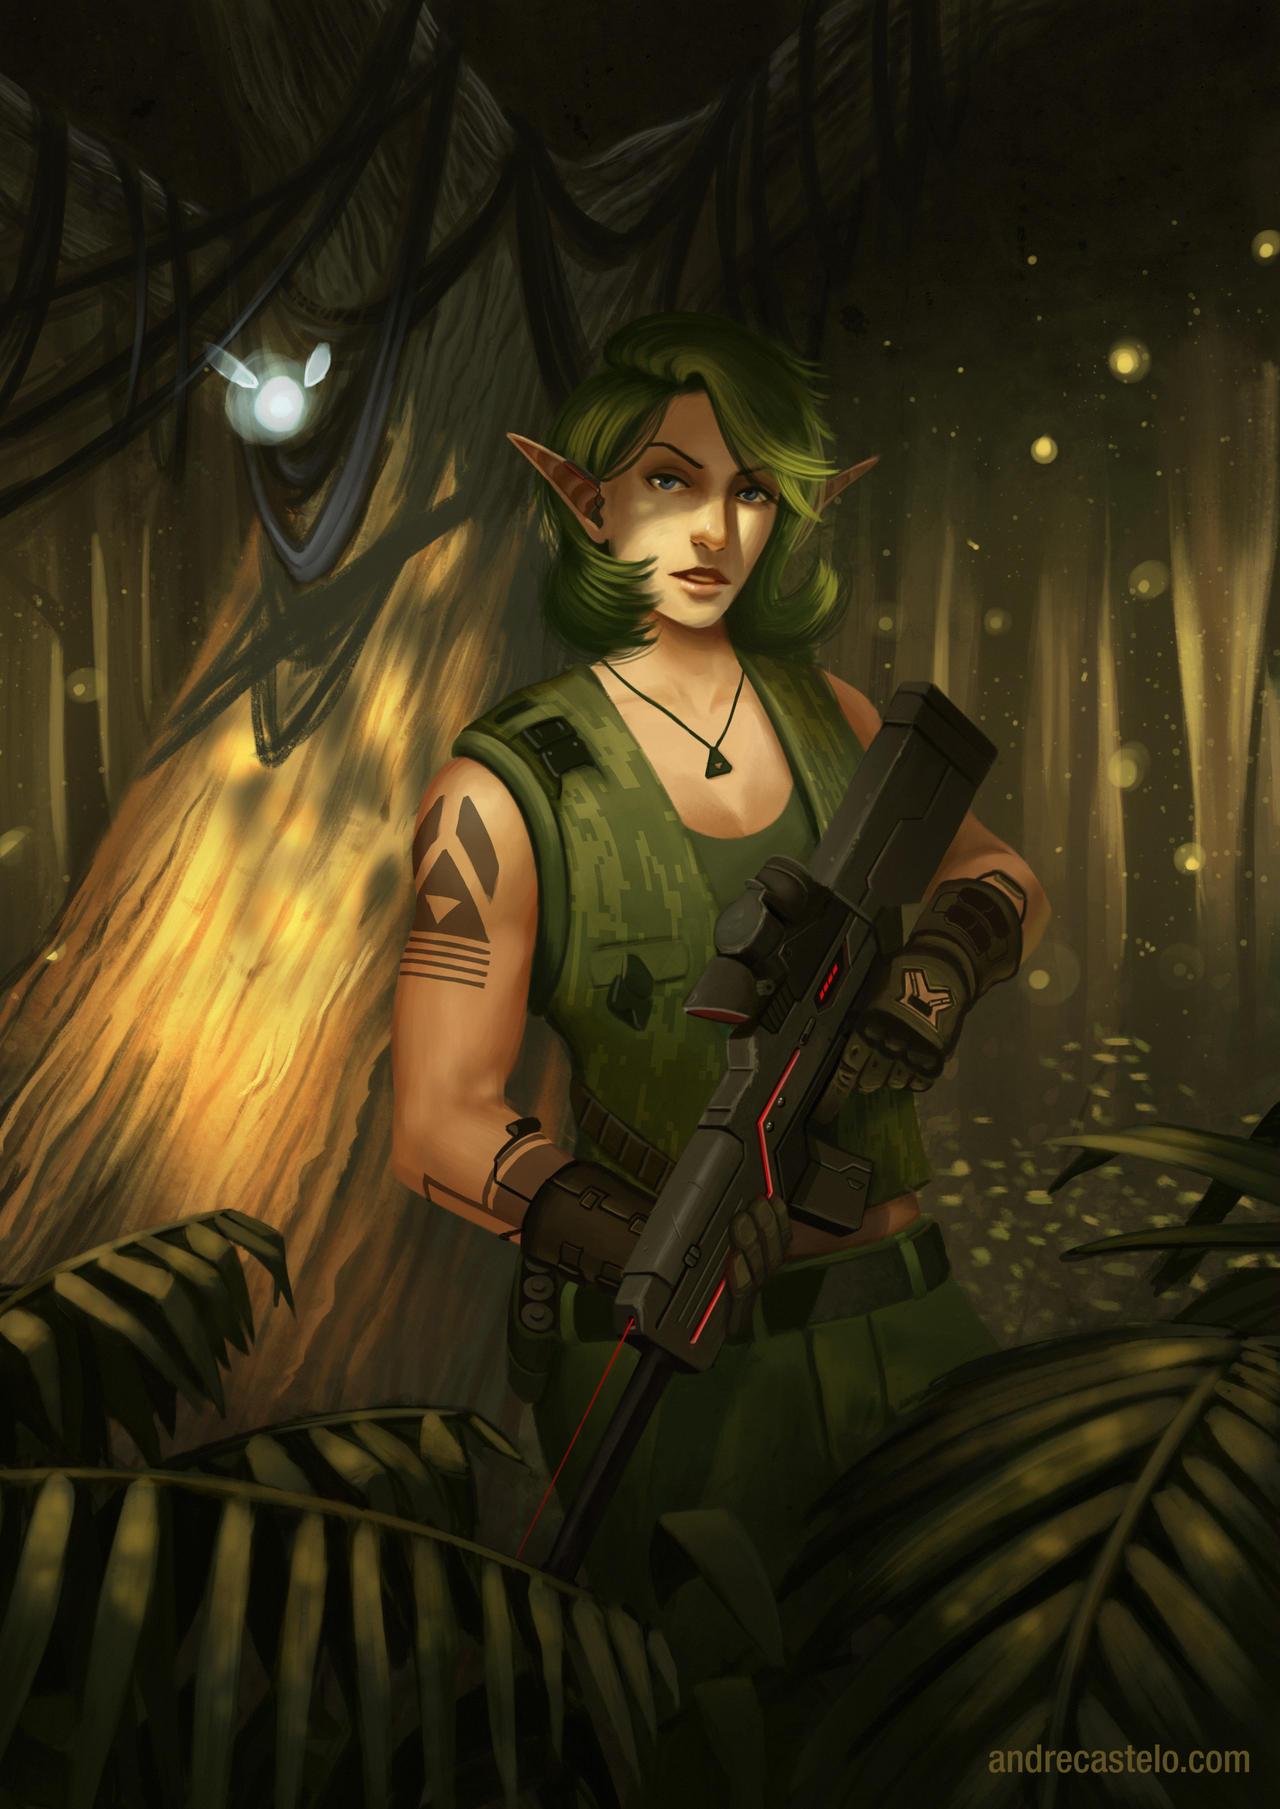 Cyberpunk: Saria by andrecastelo on DeviantArt